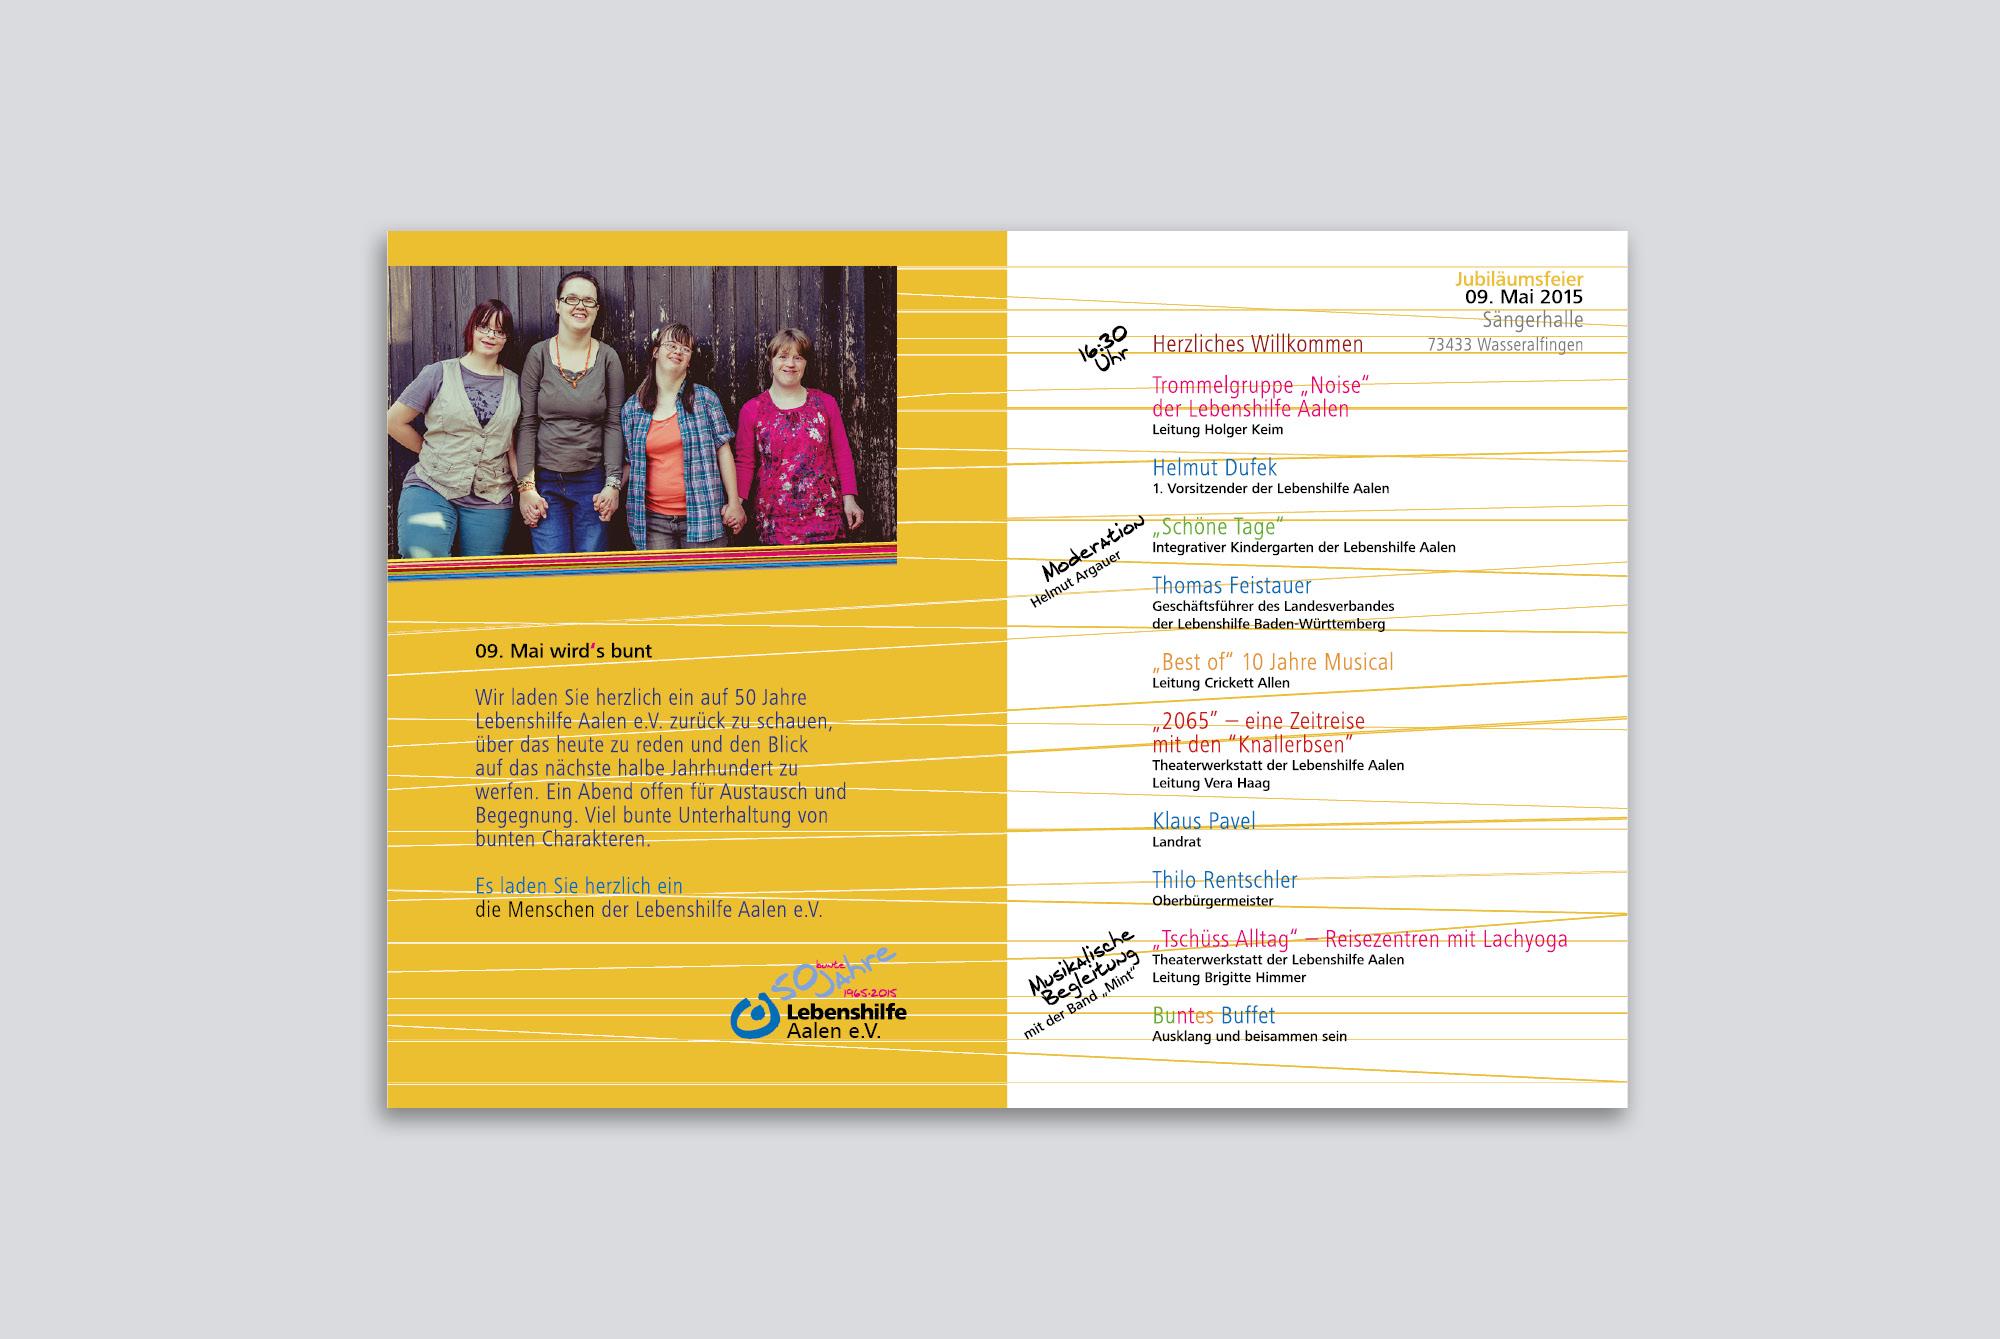 lebenshilfe-aalen-50jahre-jubilaeum-02-2015